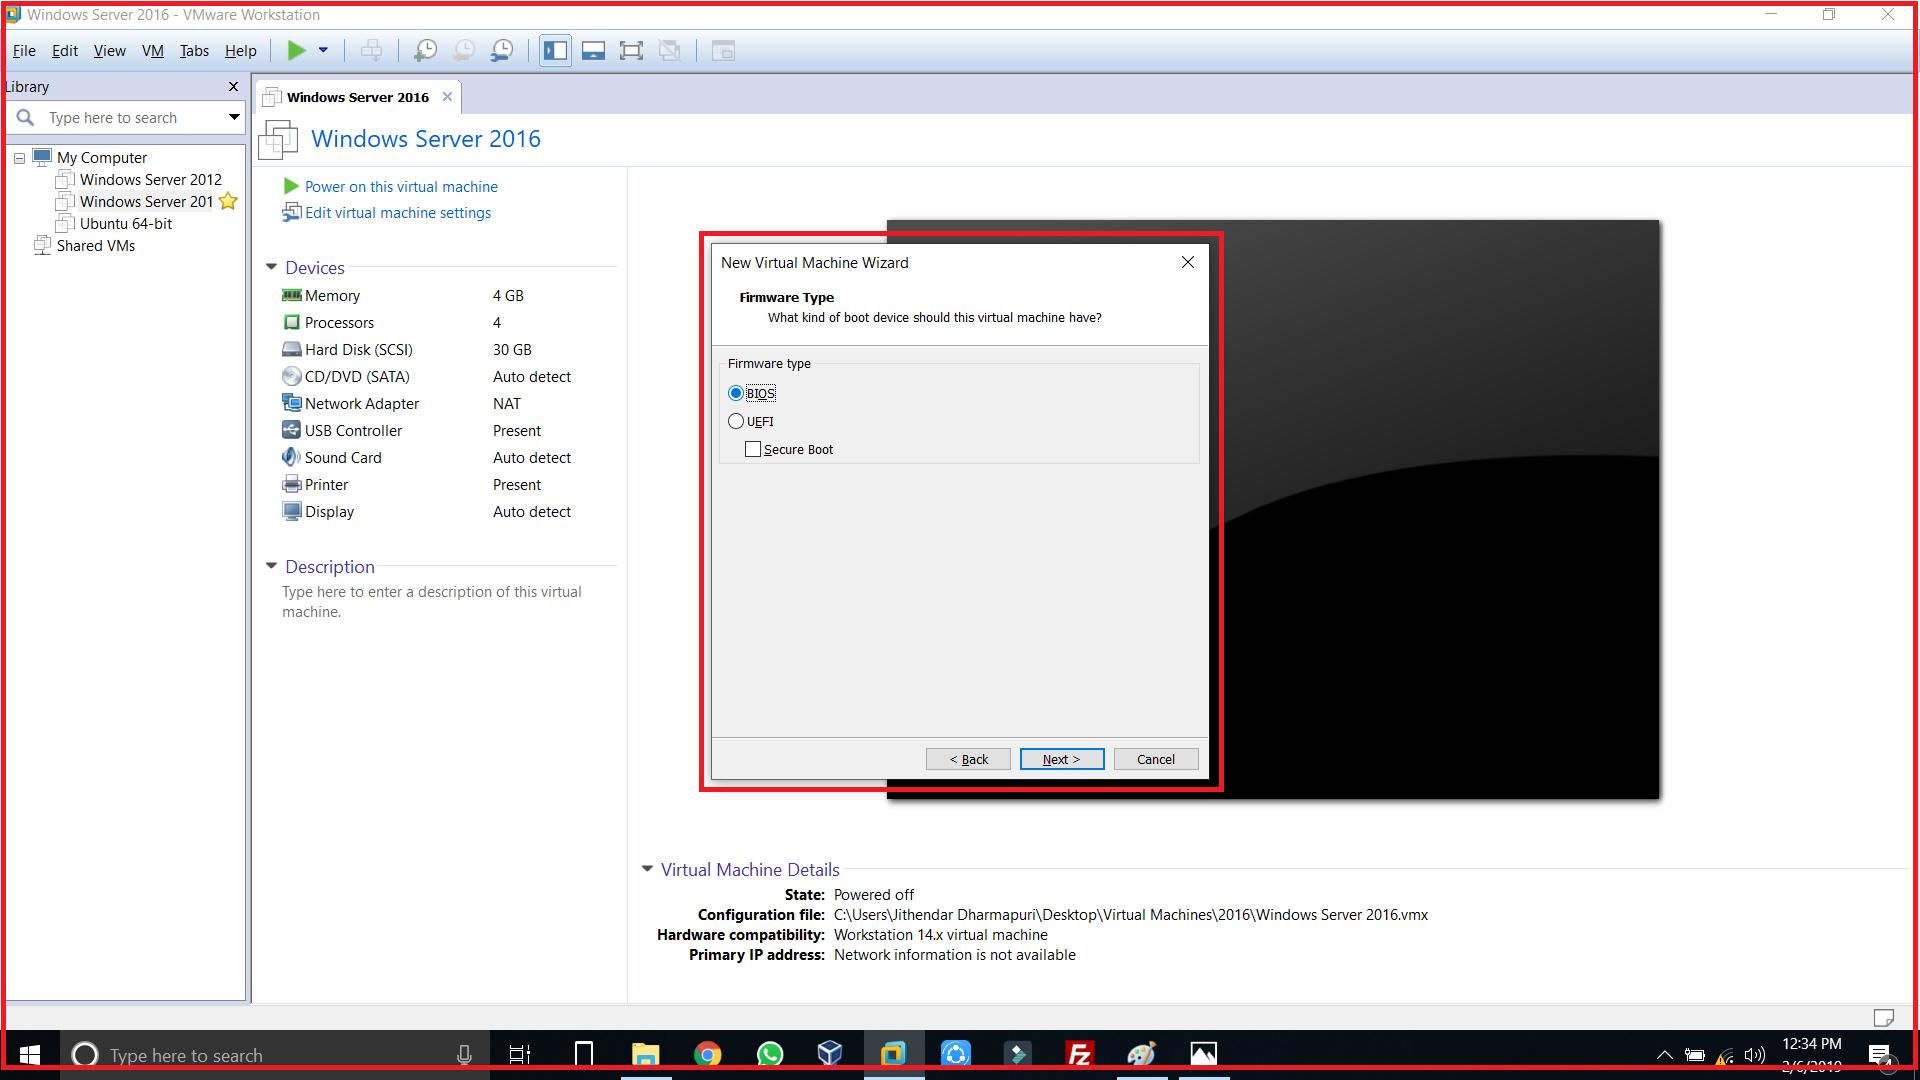 firmware type select bios or UEFI